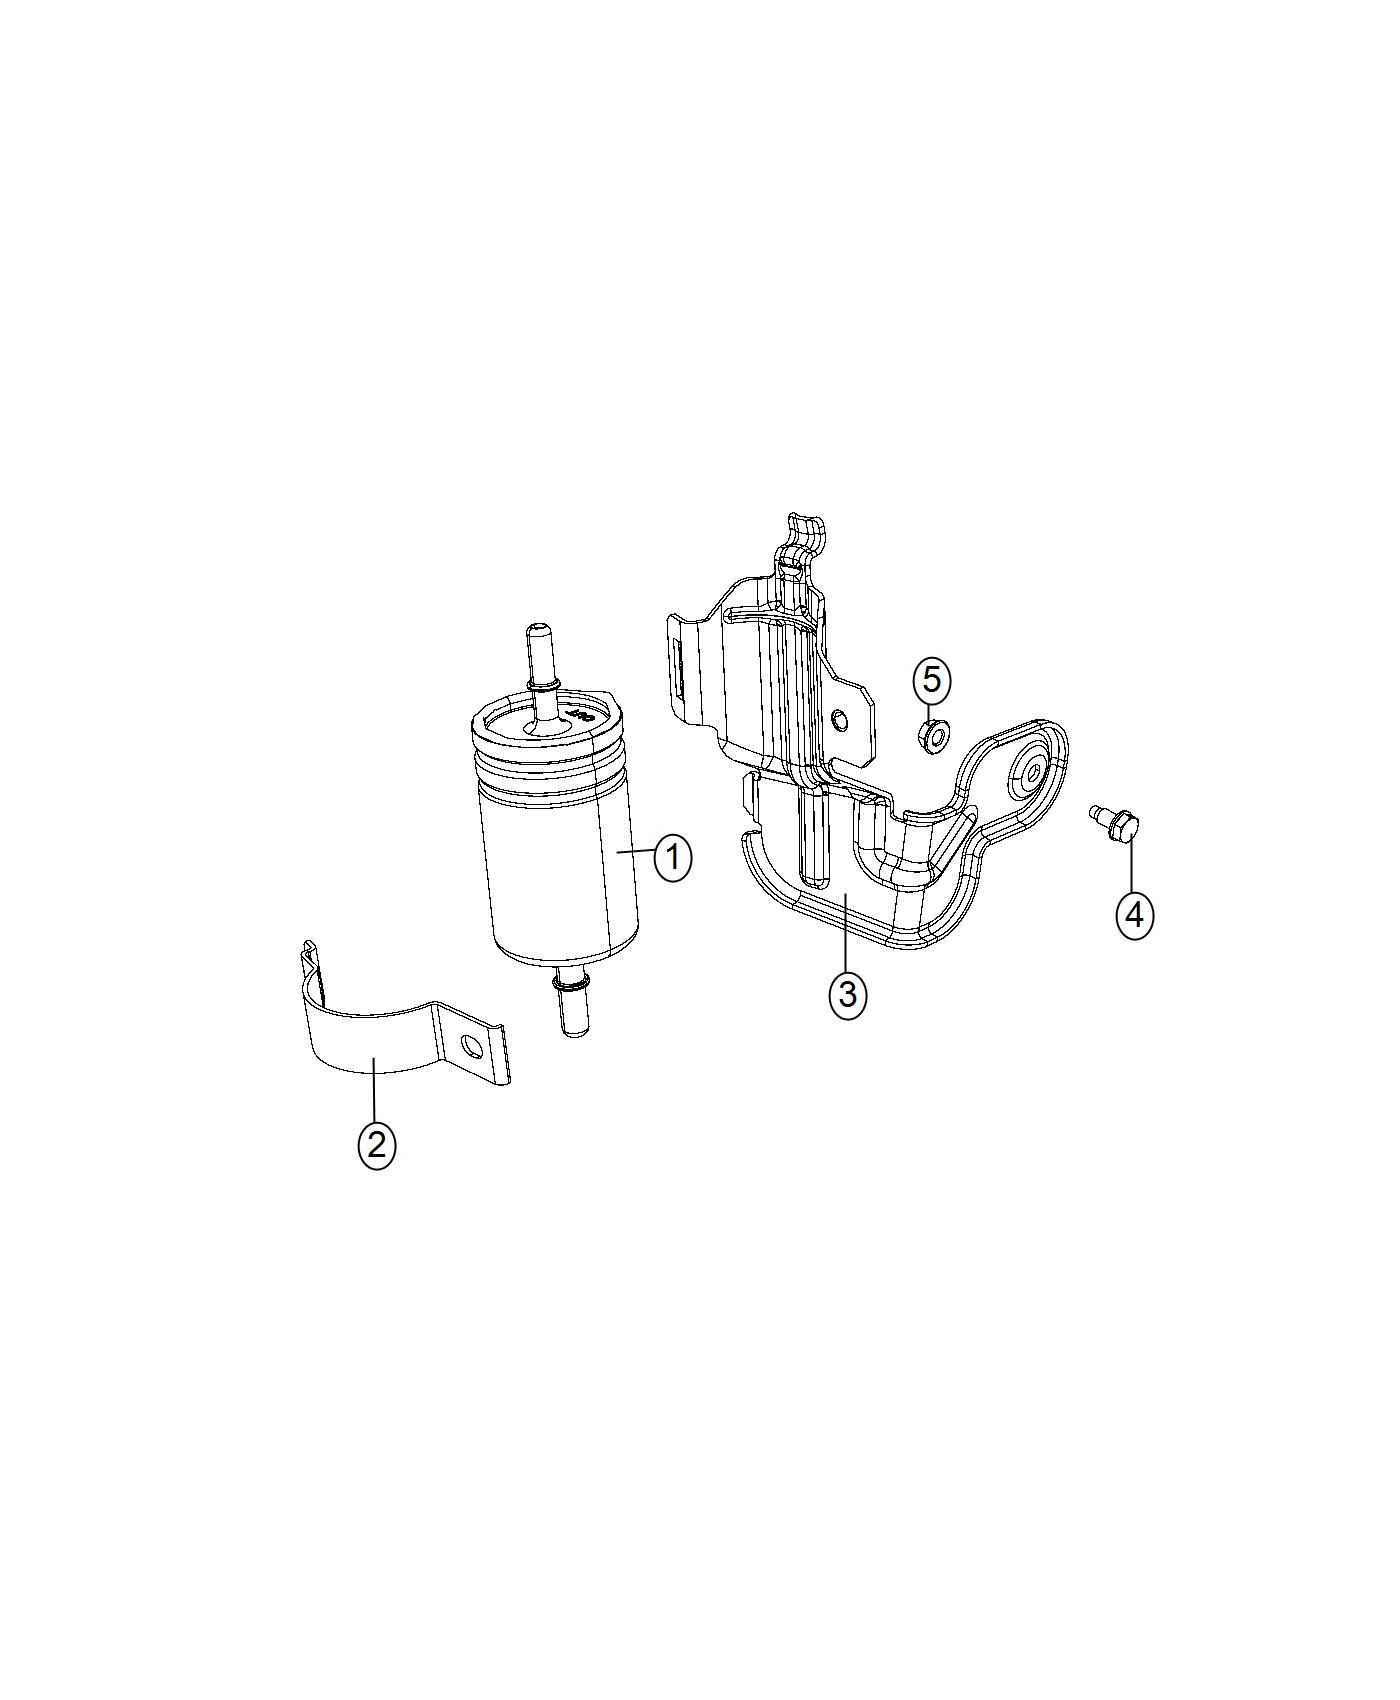 Jeep Renegade Filter Fuel Export Alternate Fuel